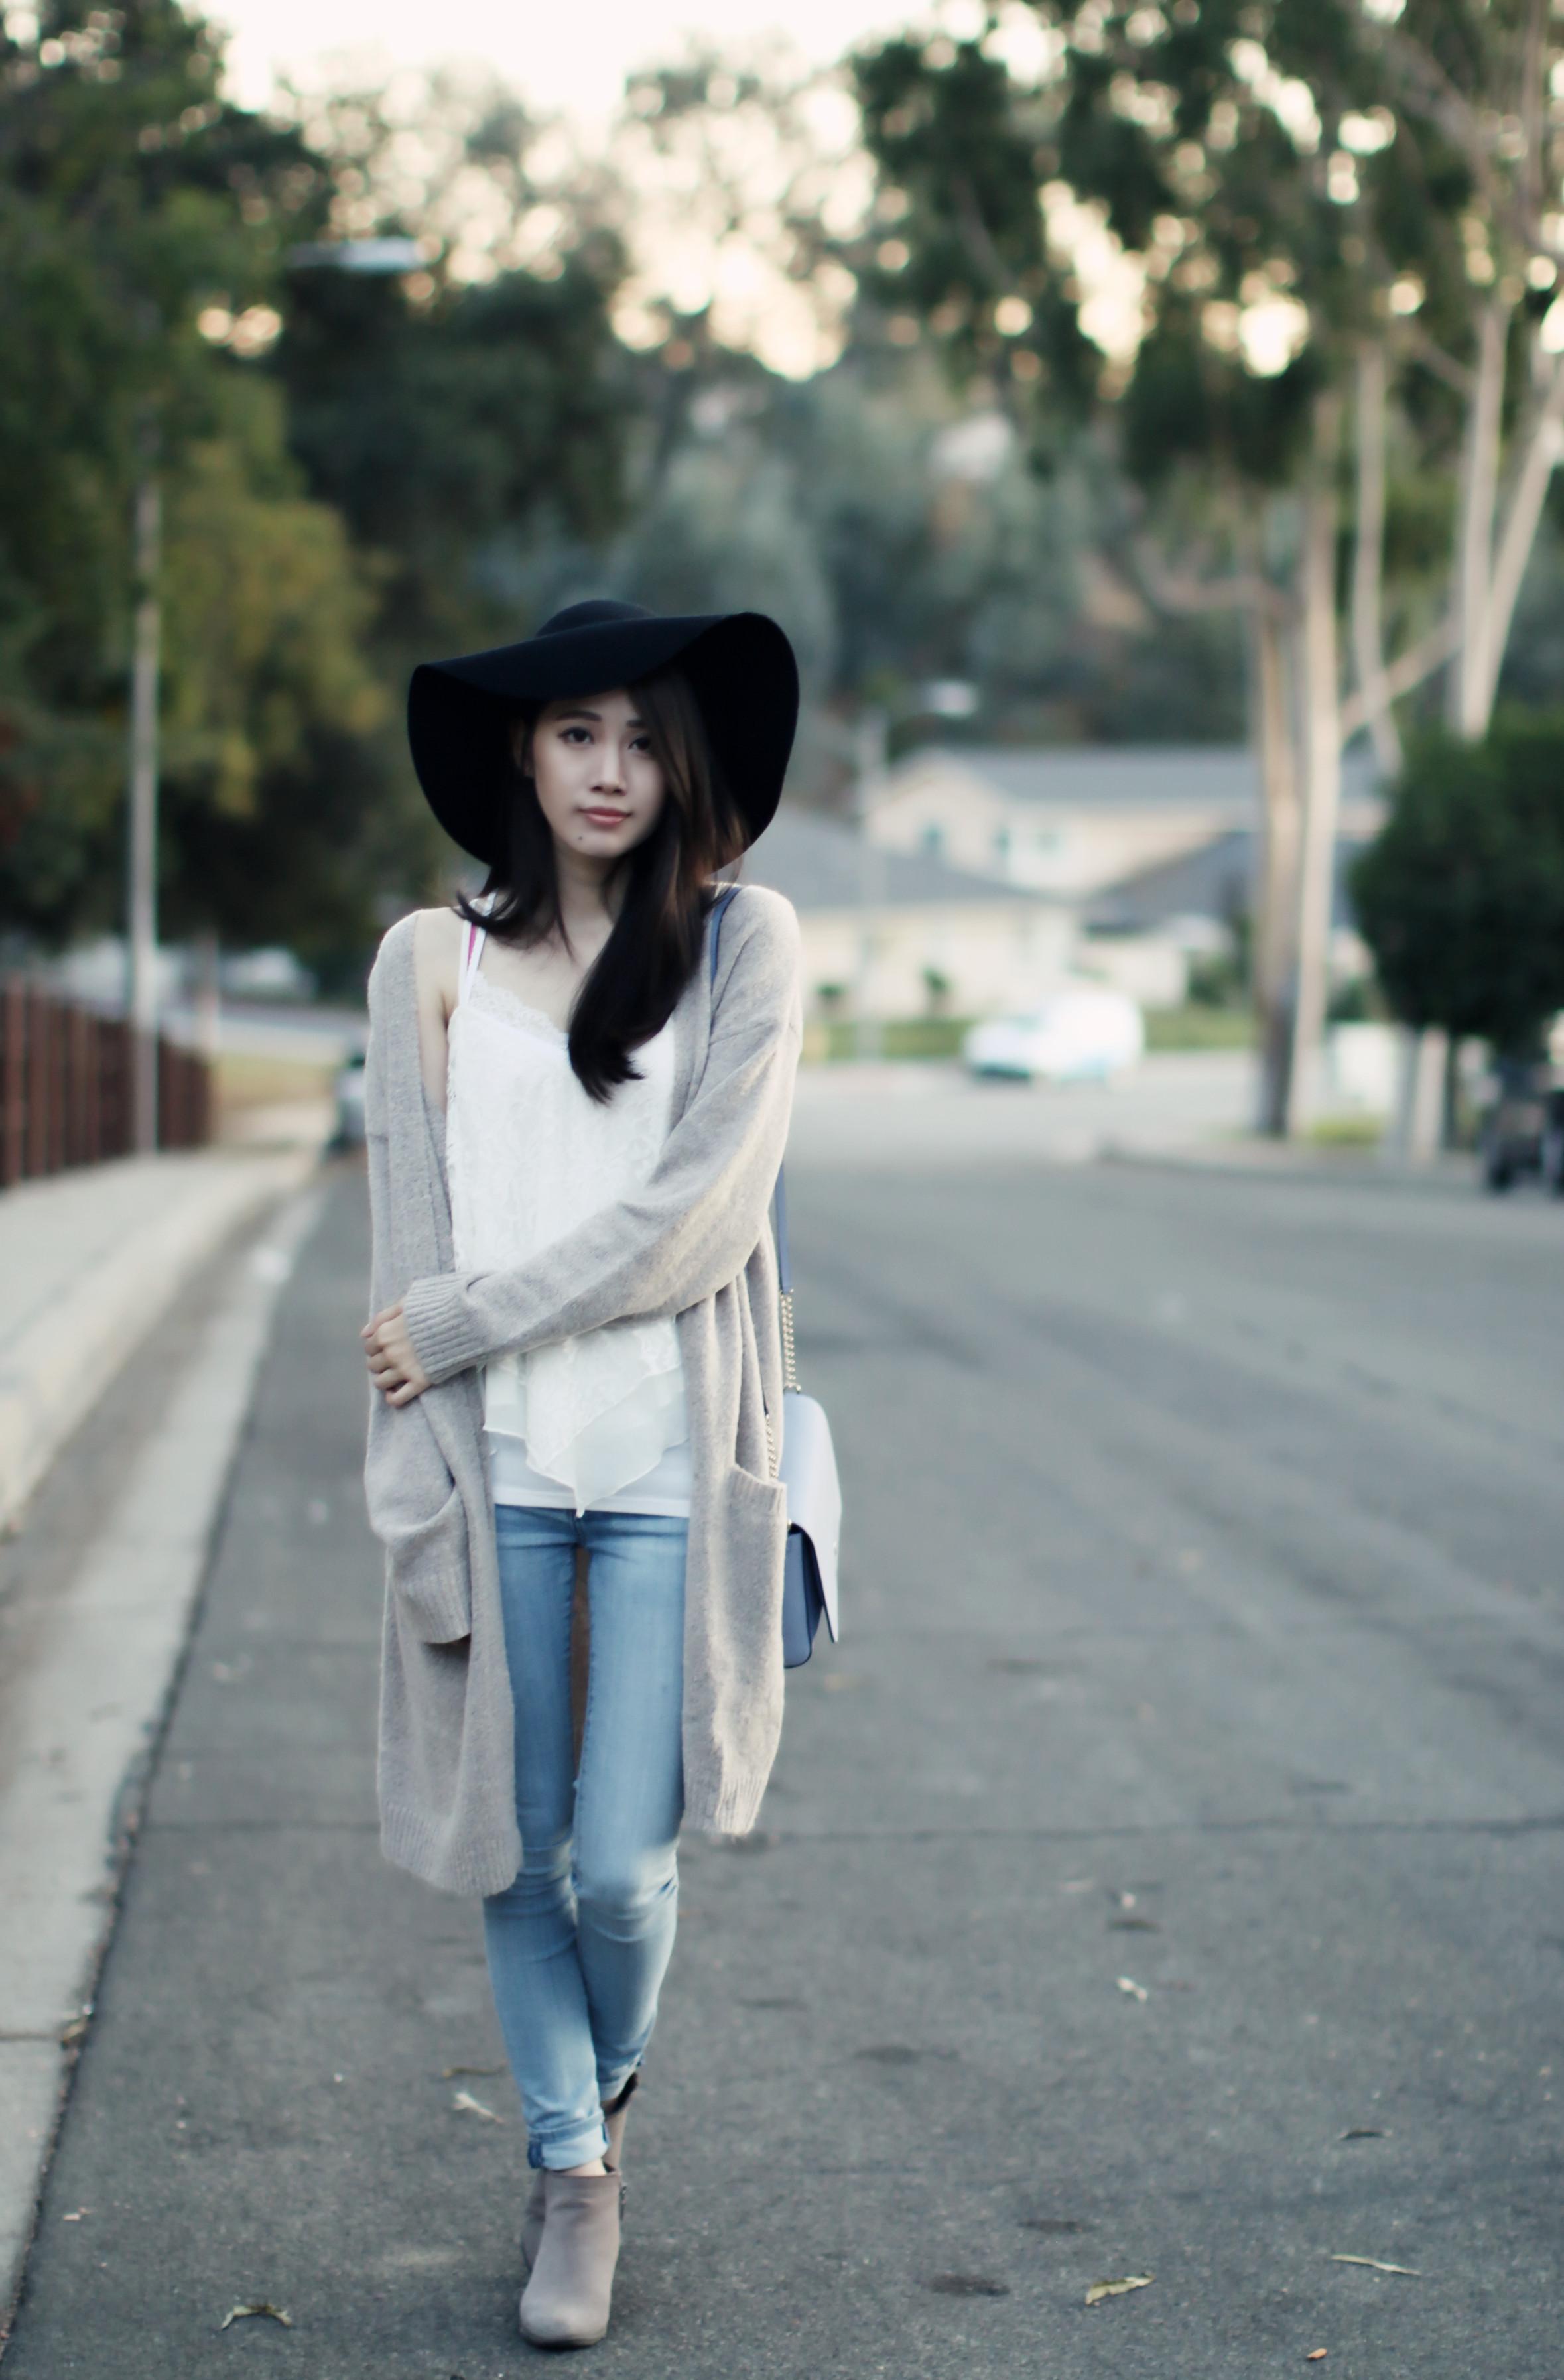 3846-ootd-fashion-style-outfitoftheday-wiwt-nordstrom-abercrombie-bohemian-fallfashion-forever21-f21-f21xme-koreanfashion-elizabeeetht-clothestoyouuu